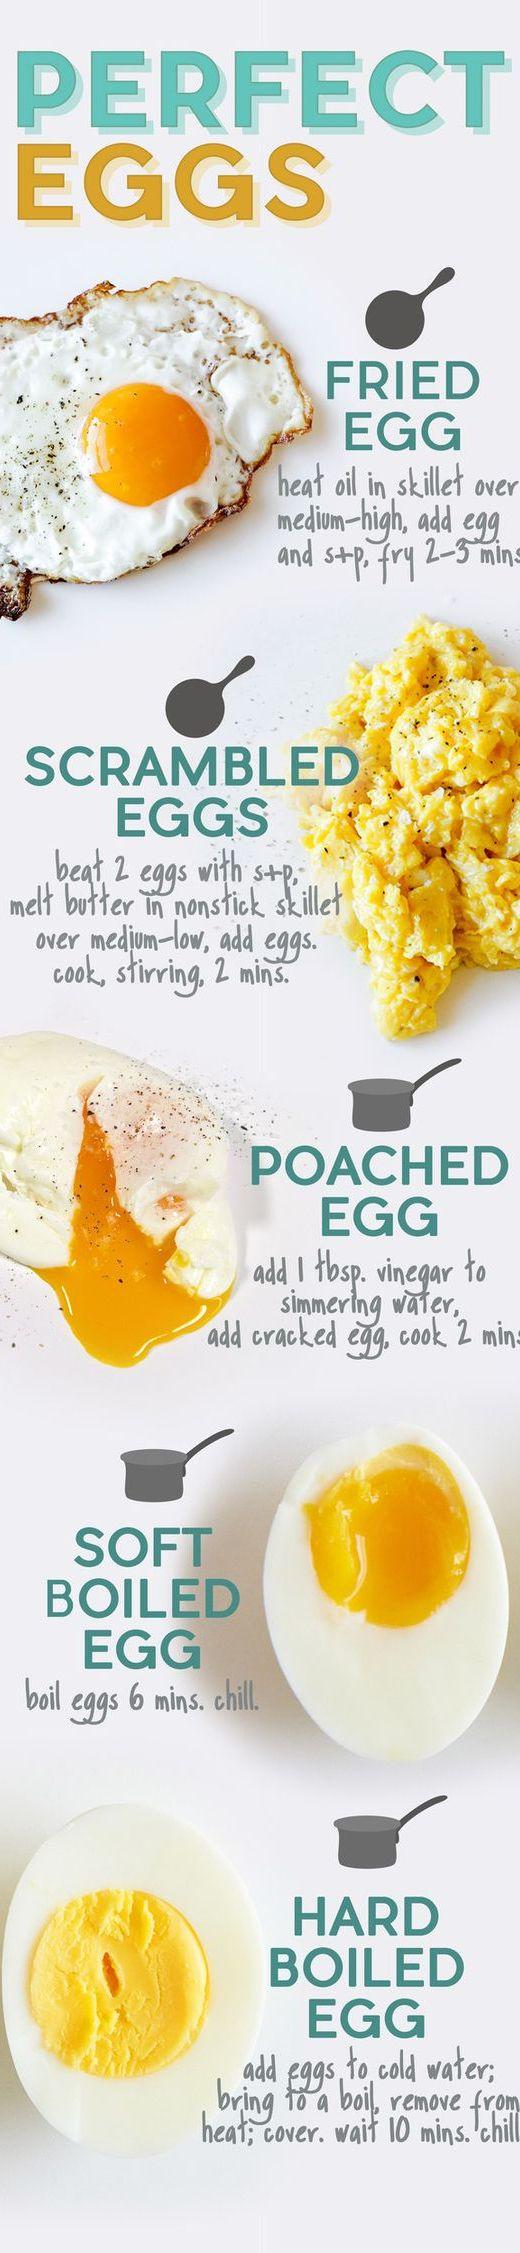 6. Eggs